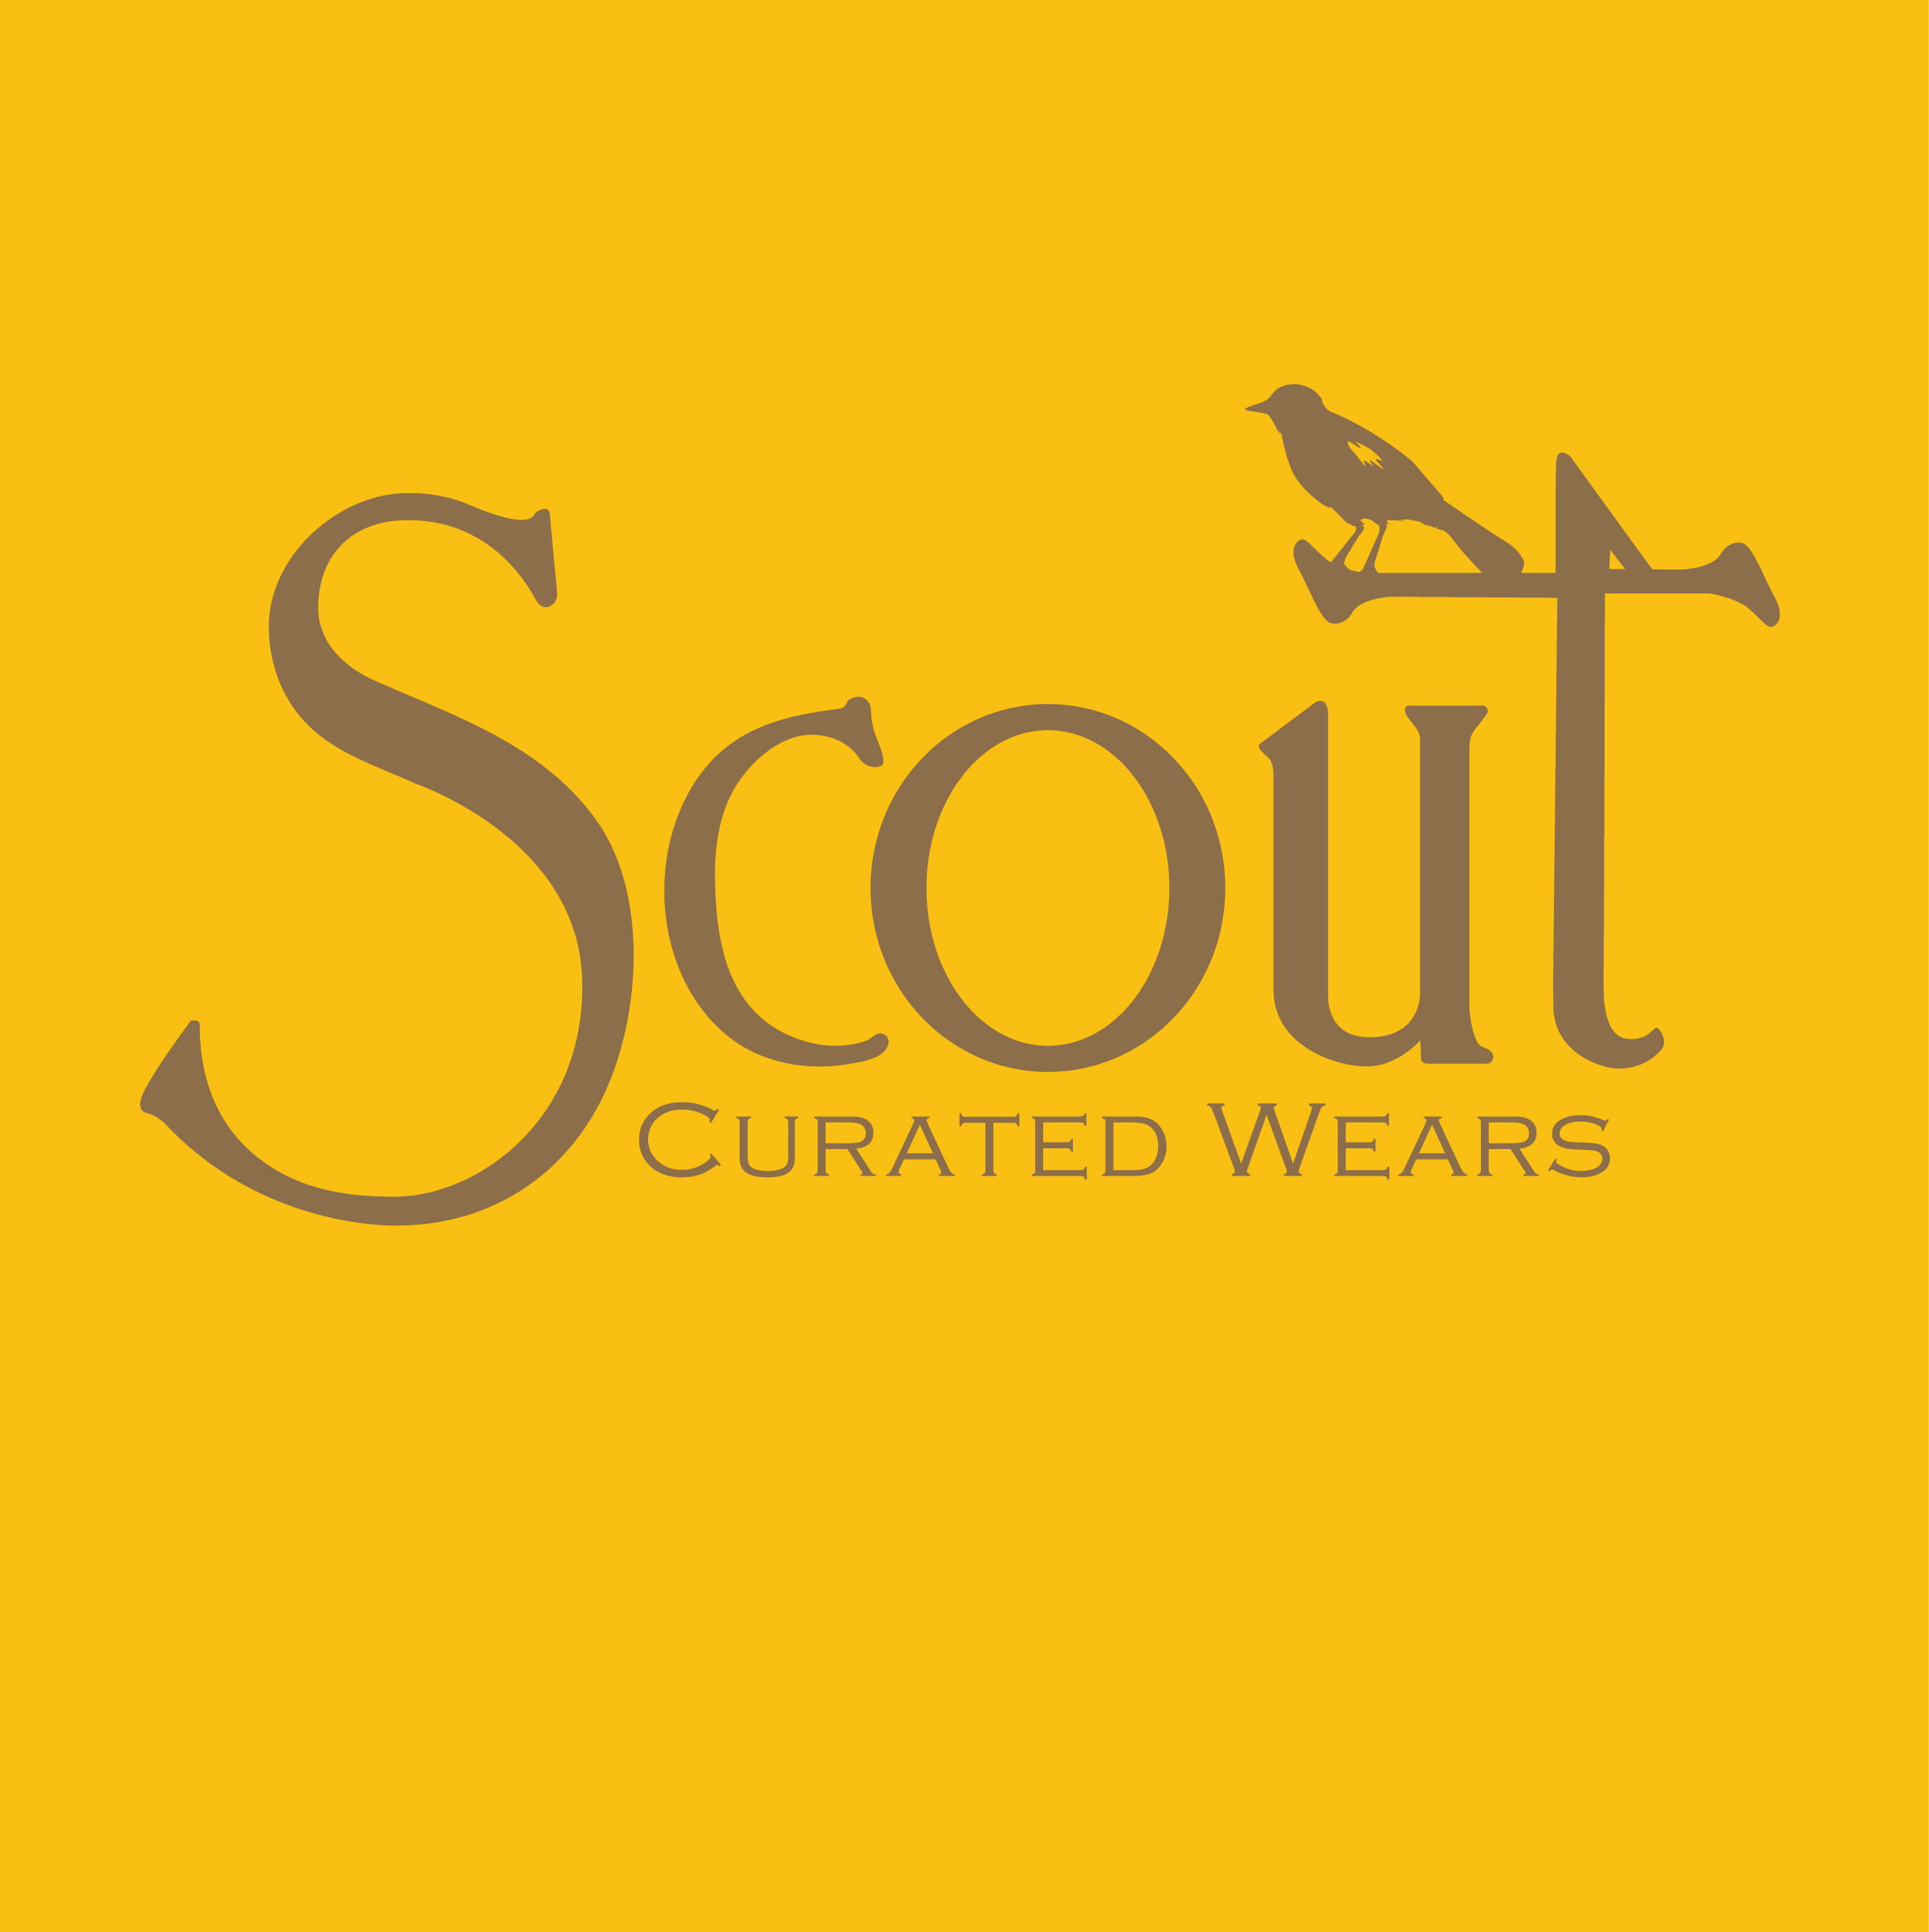 Scout_logo.jpg